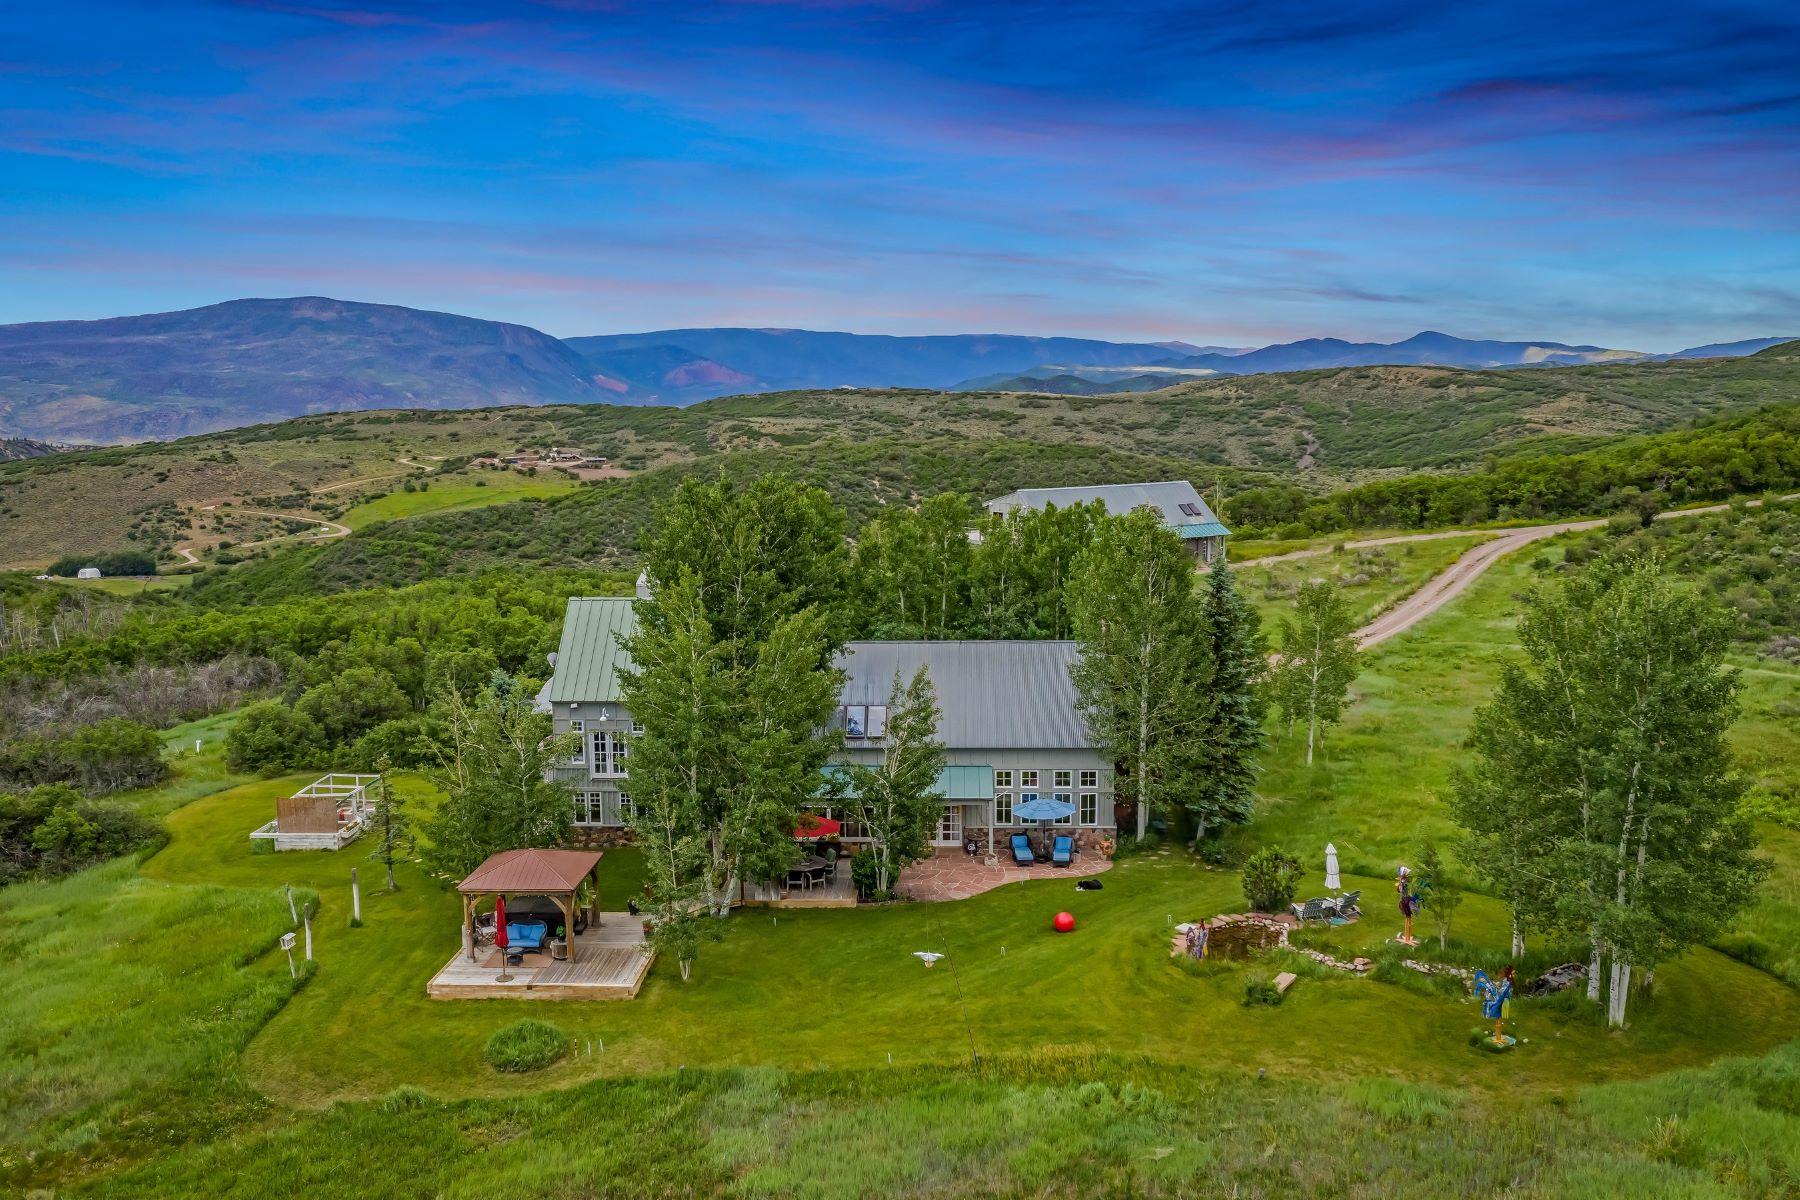 Other Residential Homes для того Продажа на 35 Acre Compound 2240 Old Herron Road, Basalt, Колорадо 81621 Соединенные Штаты